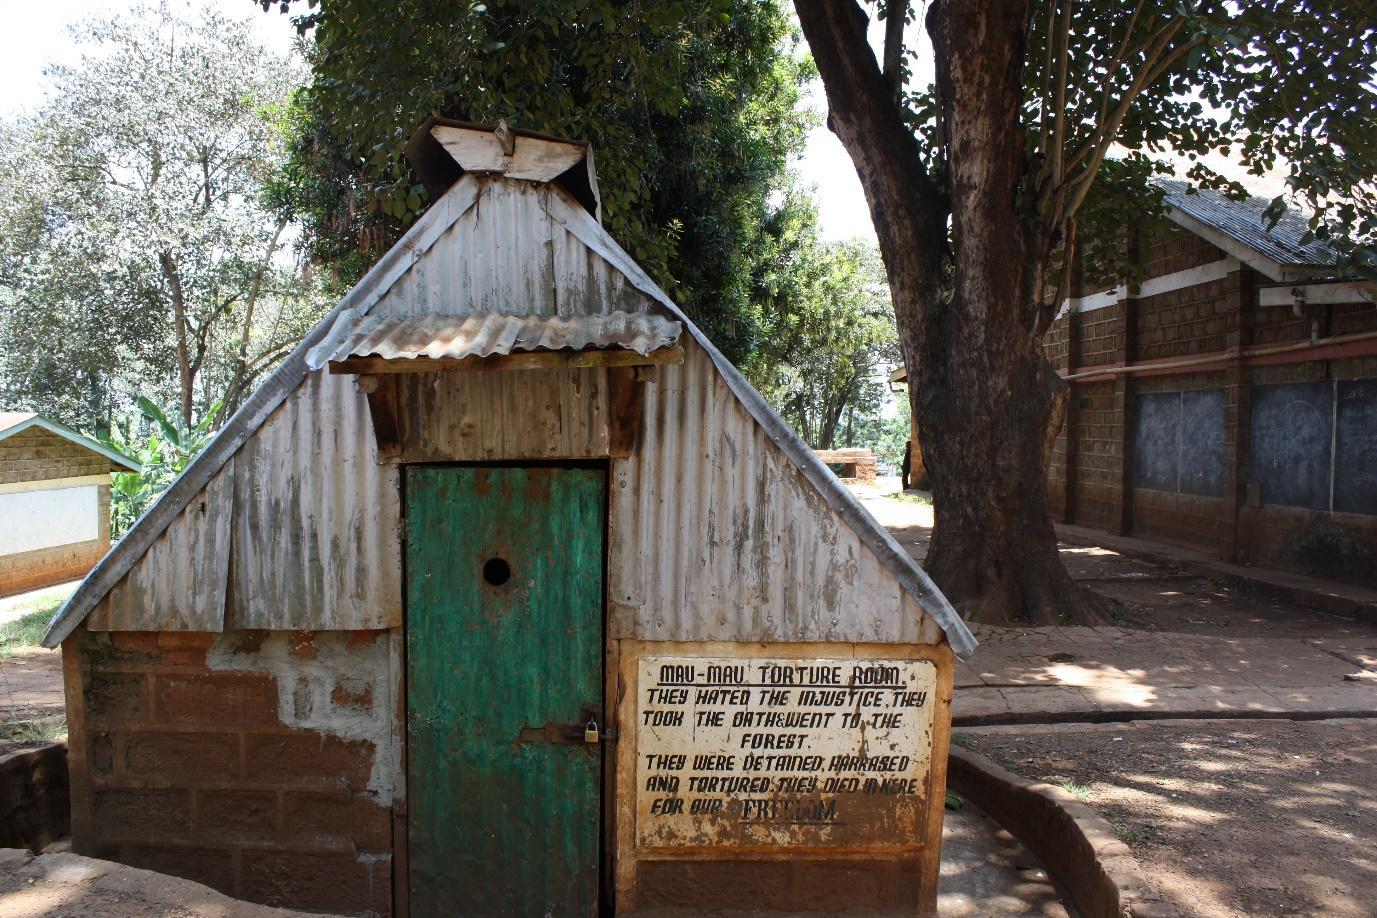 Figure 6: Former torture chamber Mweru camp as it appears in present day Mweru High School